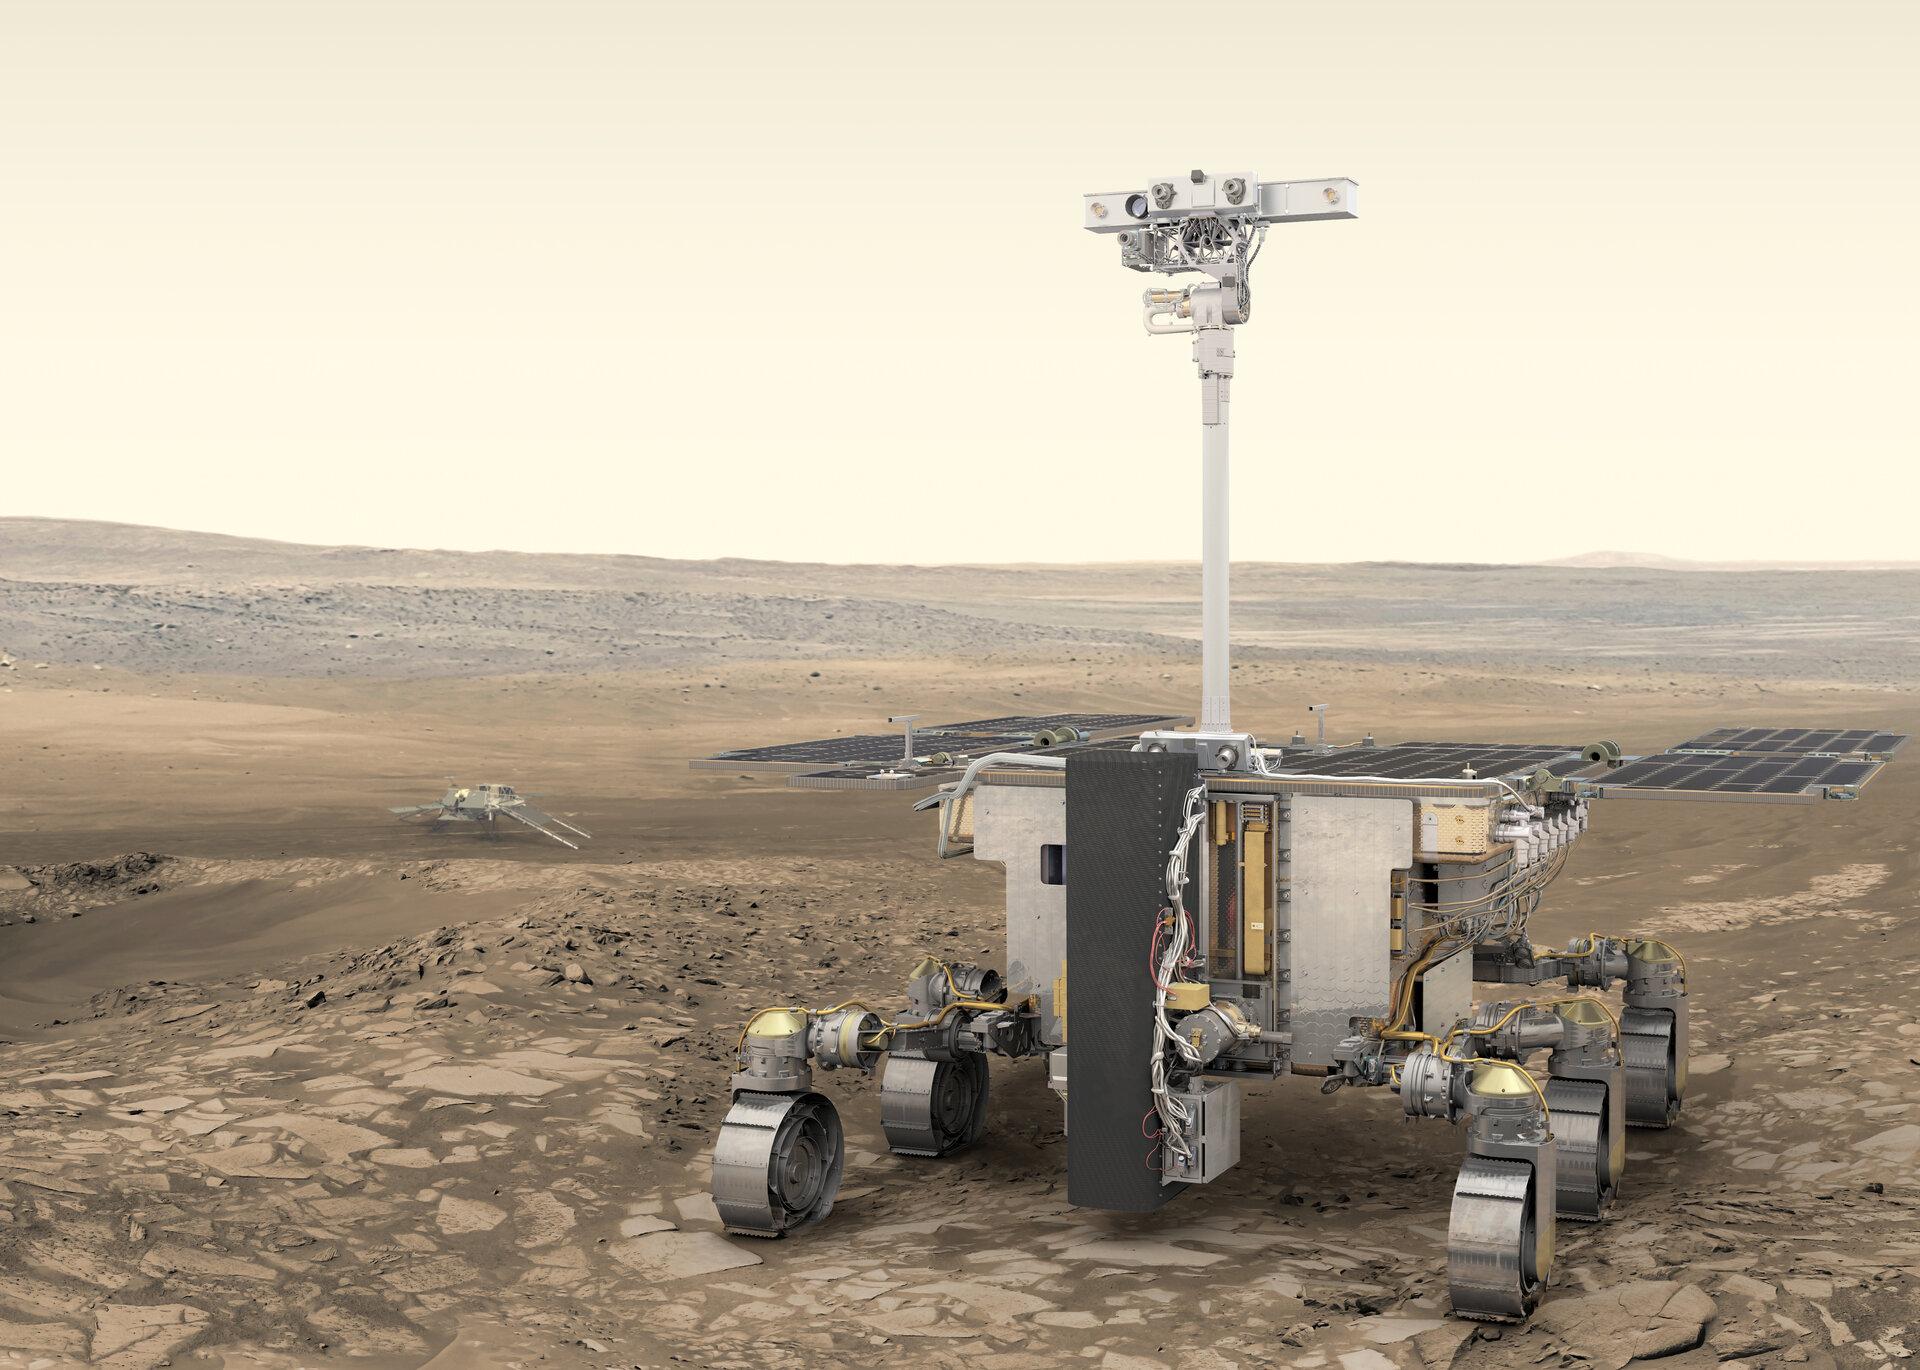 http://www.esa.int/var/esa/storage/images/esa_multimedia/images/2017/03/exomars_rover/16873157-4-eng-GB/ExoMars_rover_pillars.jpg